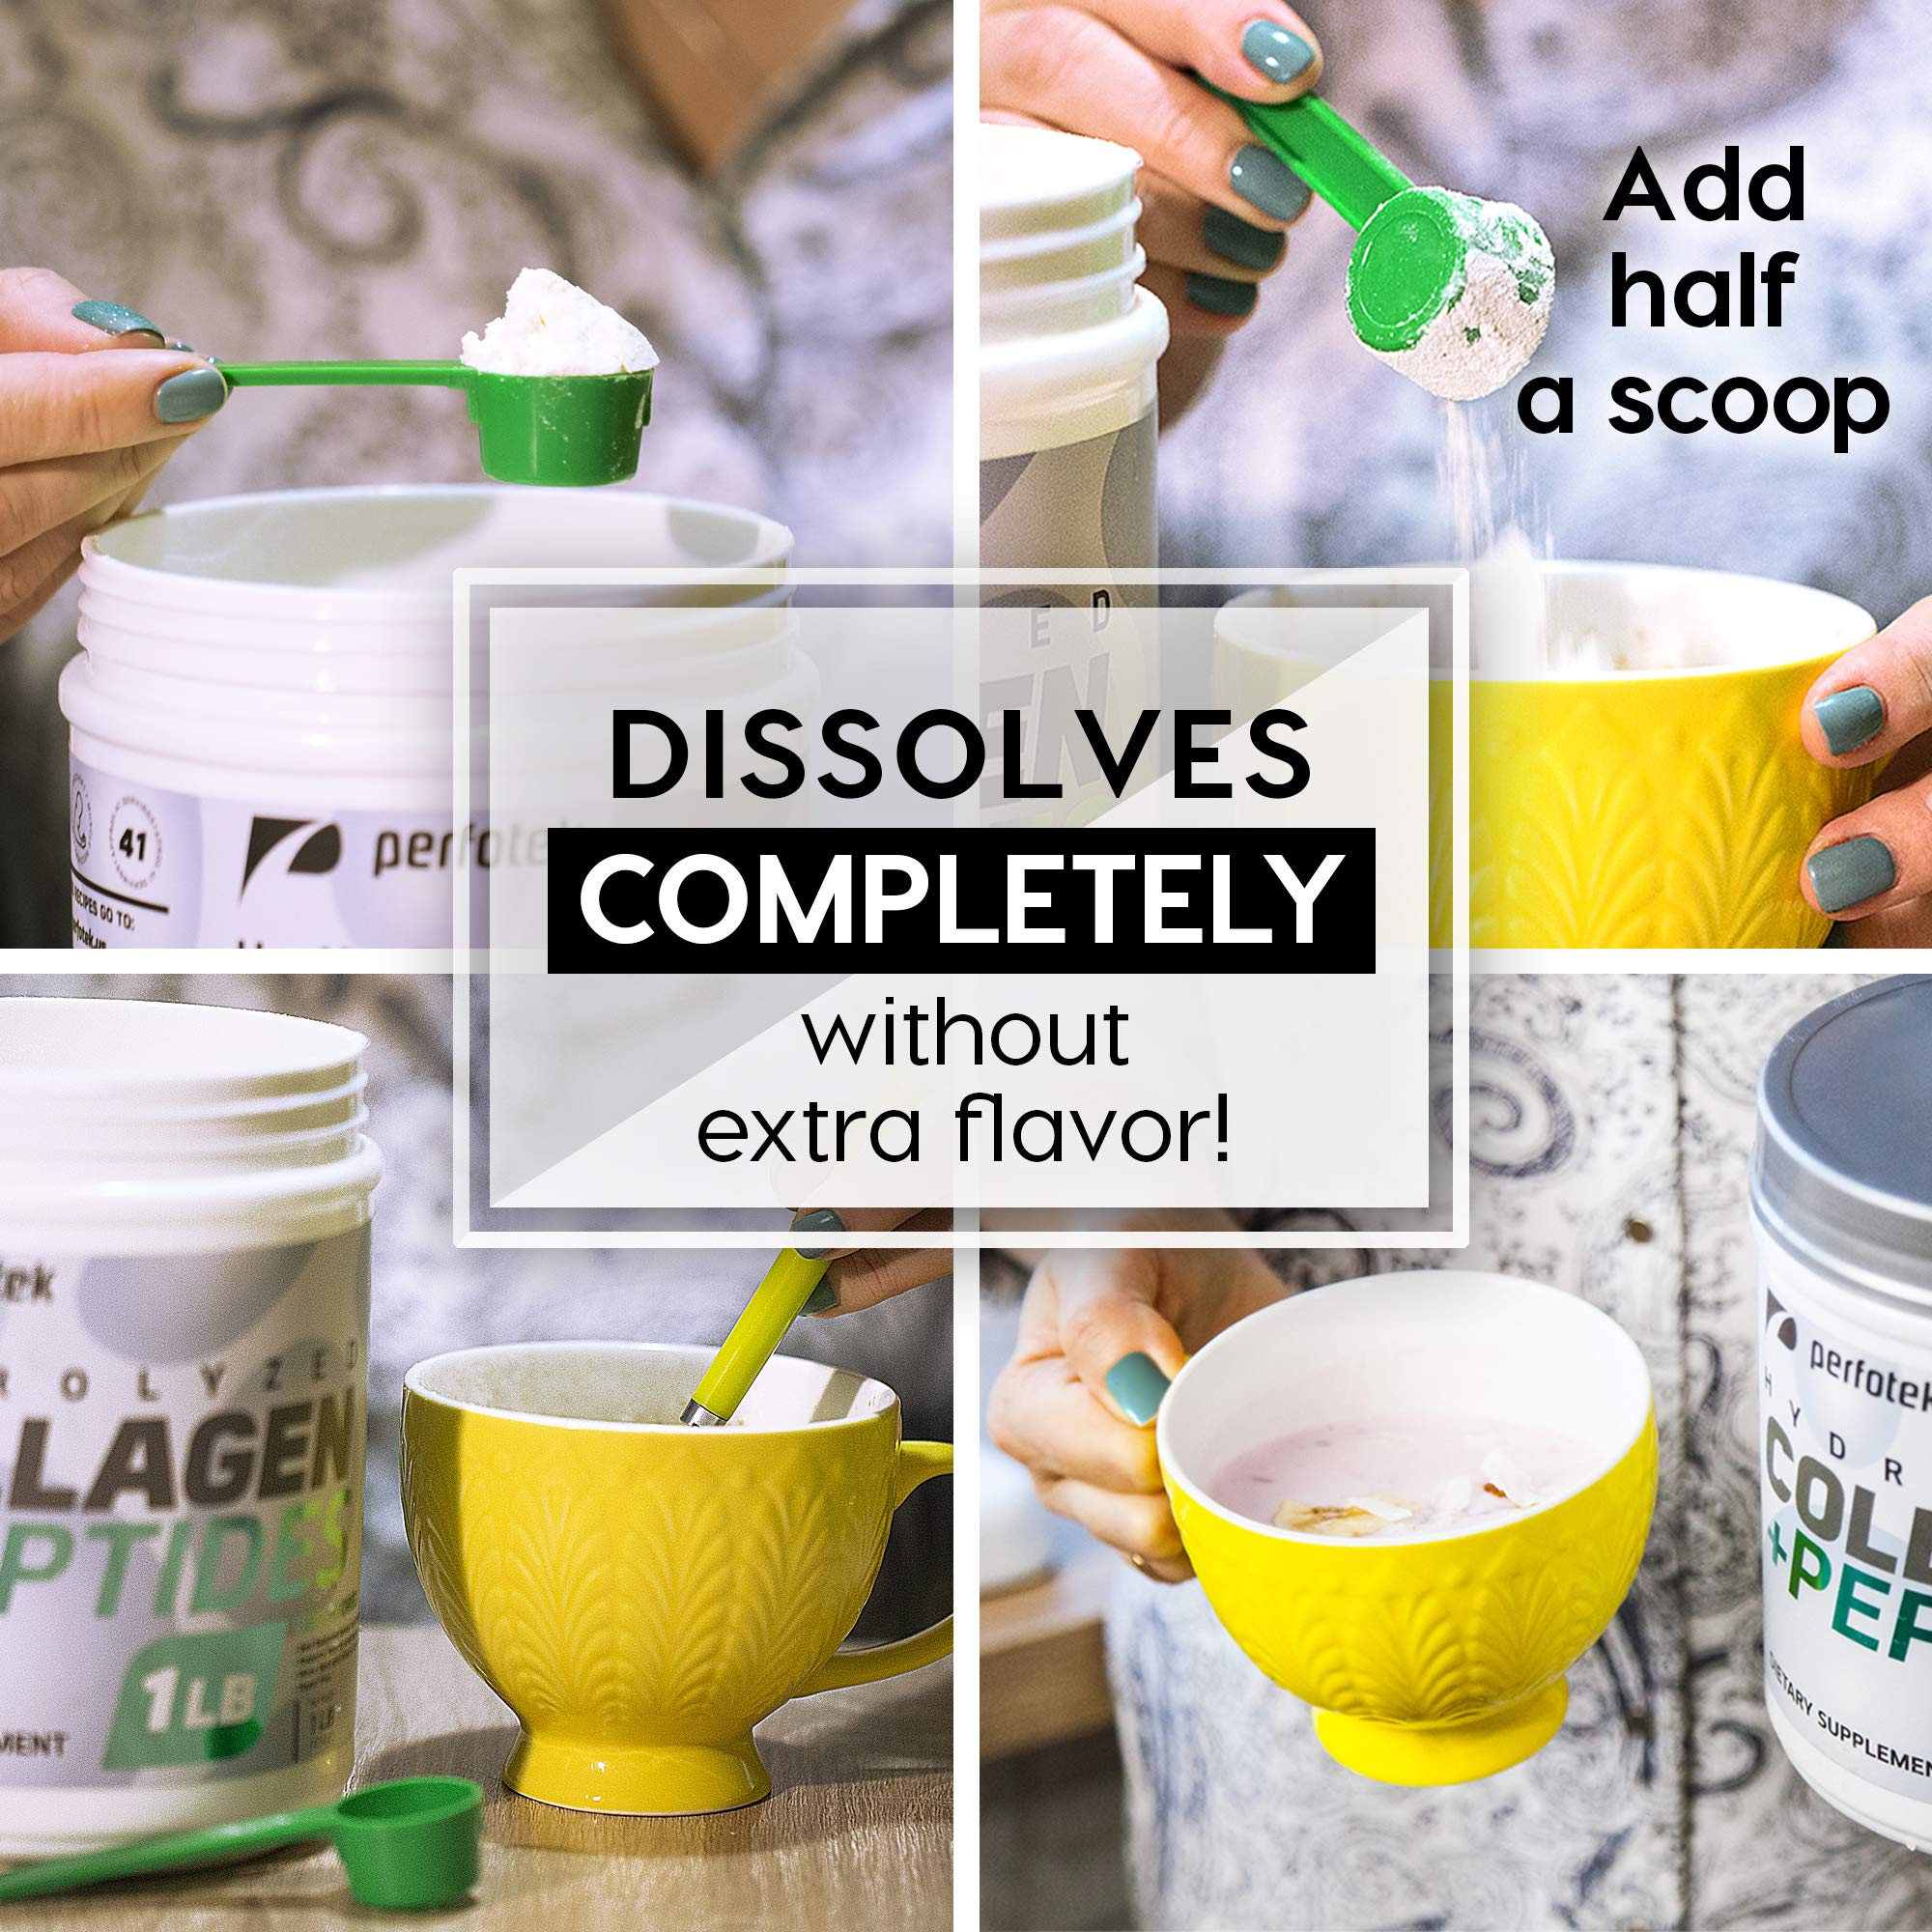 afc6b68a0043d Collagen Peptides Hydrolyzed Powder 16 oz (Pack of 2) Non-GMO Grass-Fed  Gluten-Free Kosher Unflavored - Easy to Mix Drink - Premium Beef Collagen  ...